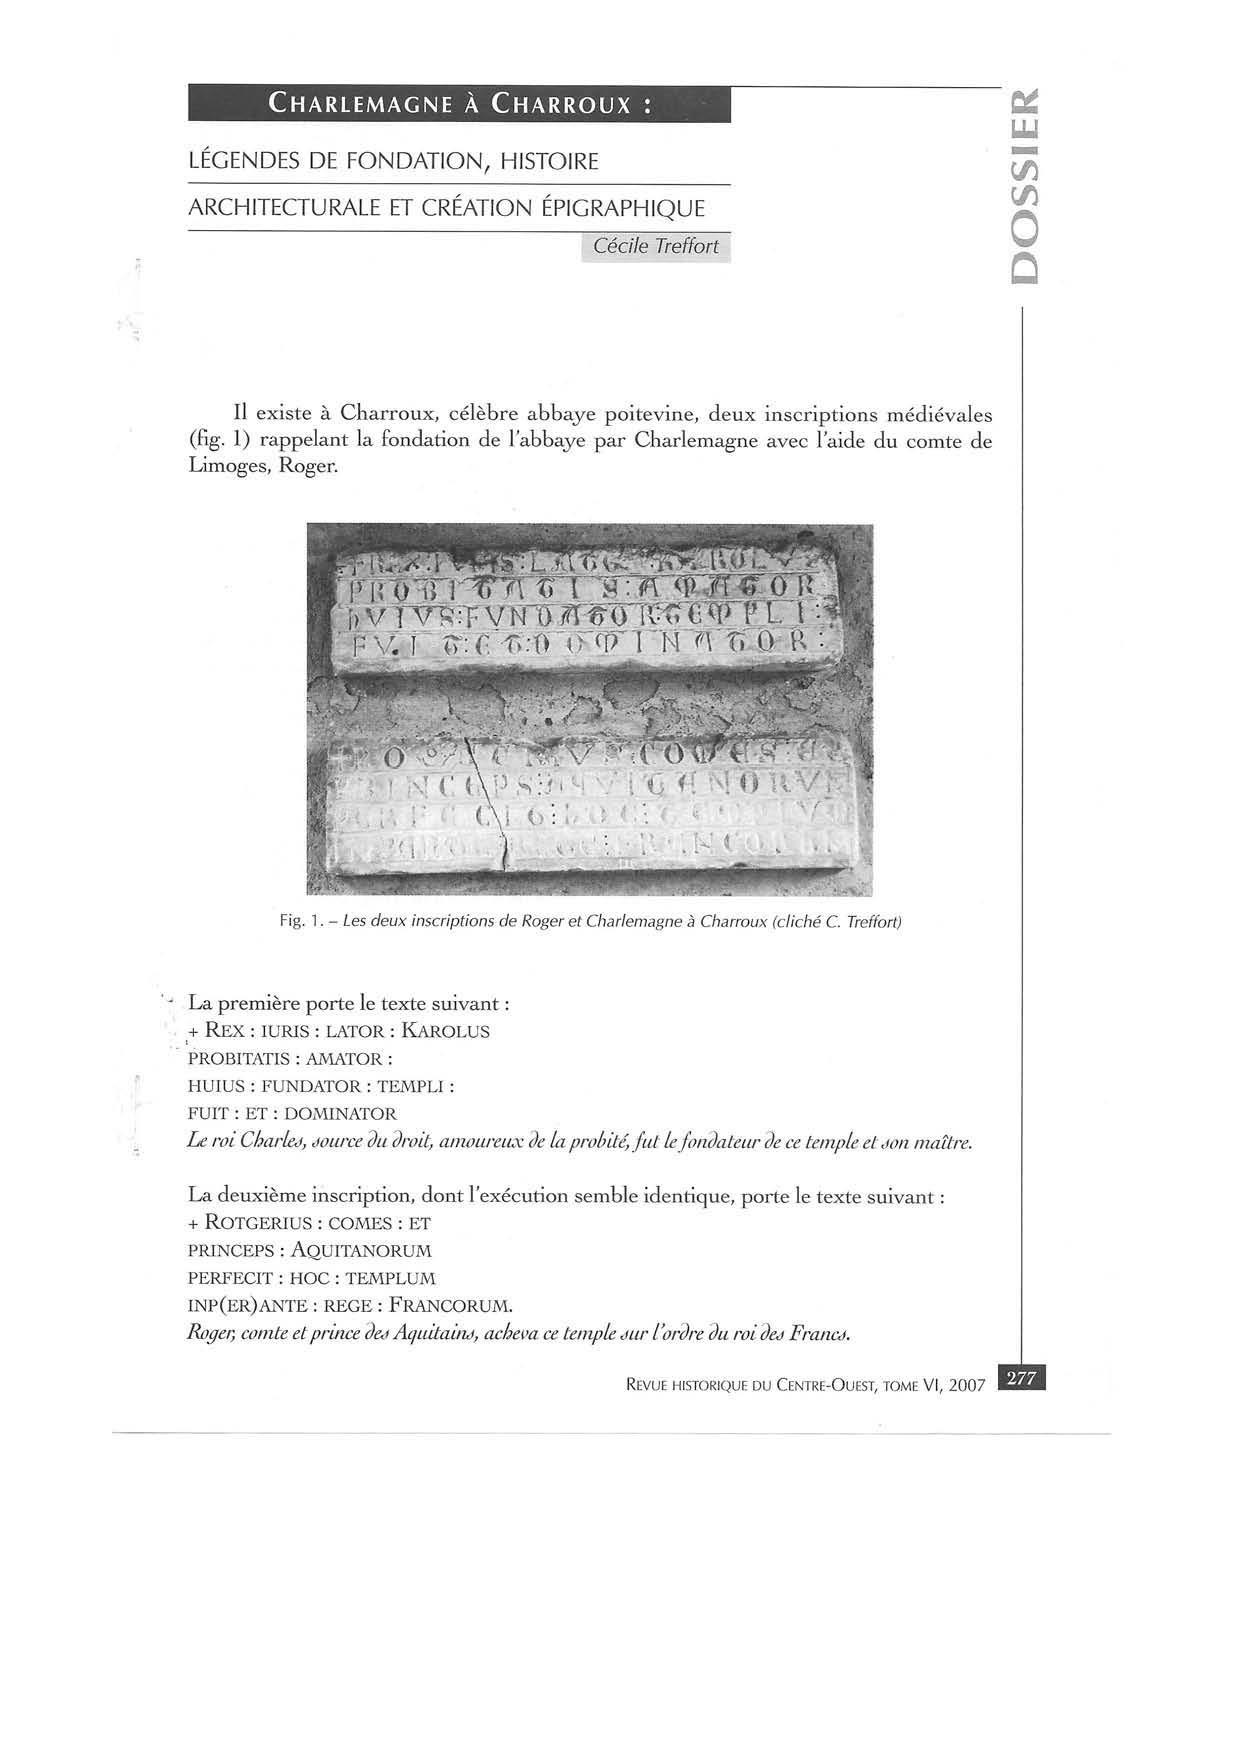 CHARLEMAGNE A CHARROUX - TREFFORT - RHCO 2007:1